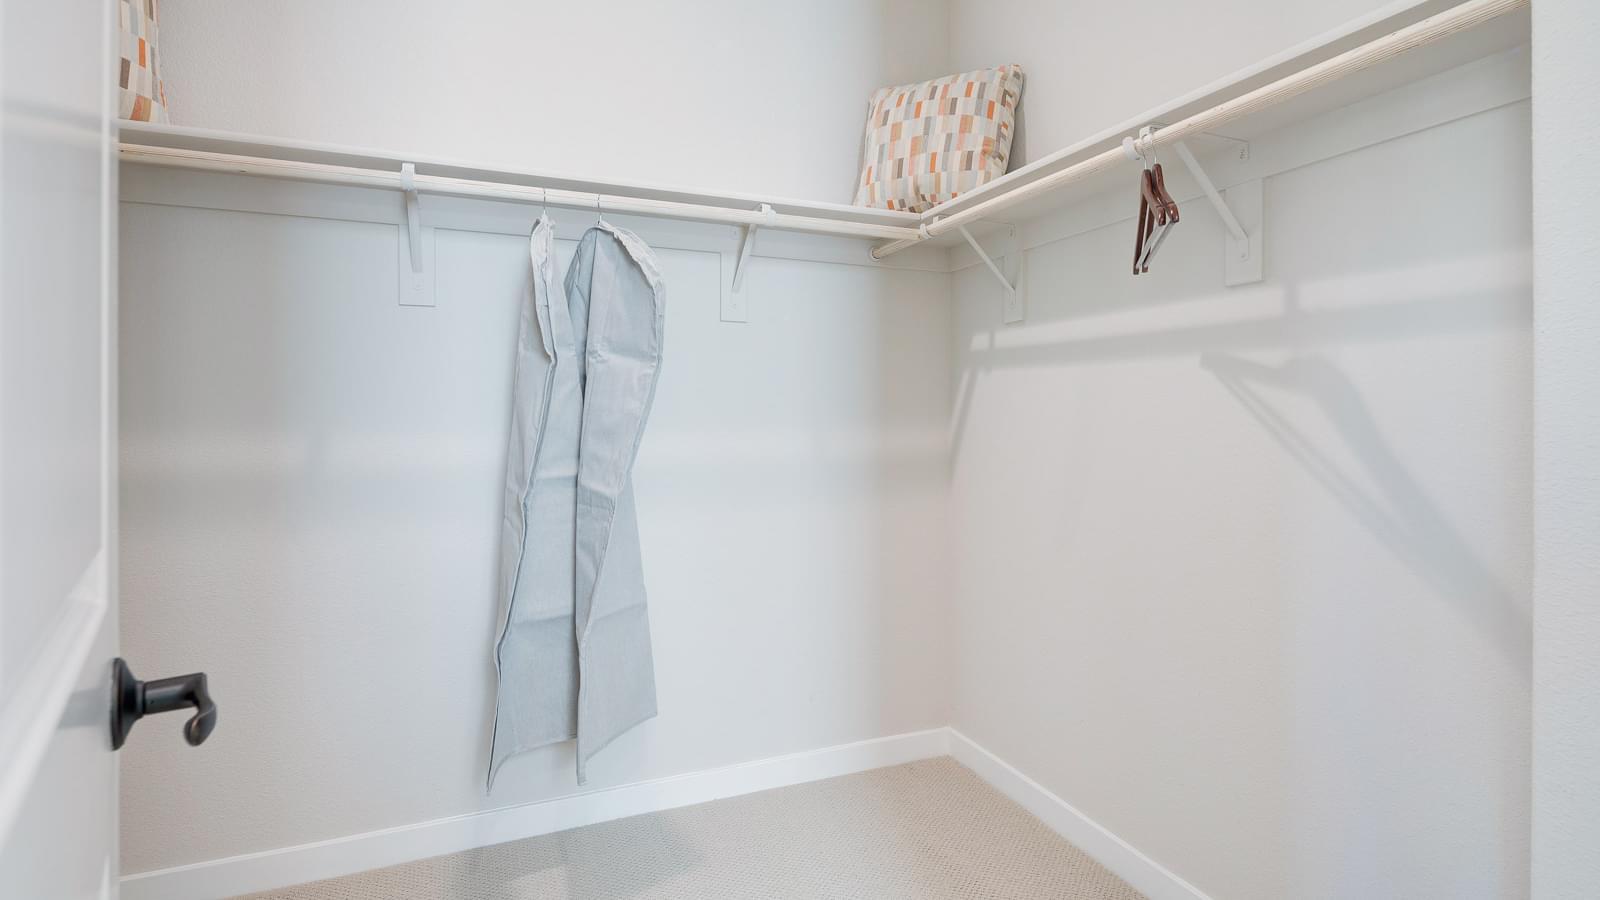 Residence 2 Master Walk-In Closet